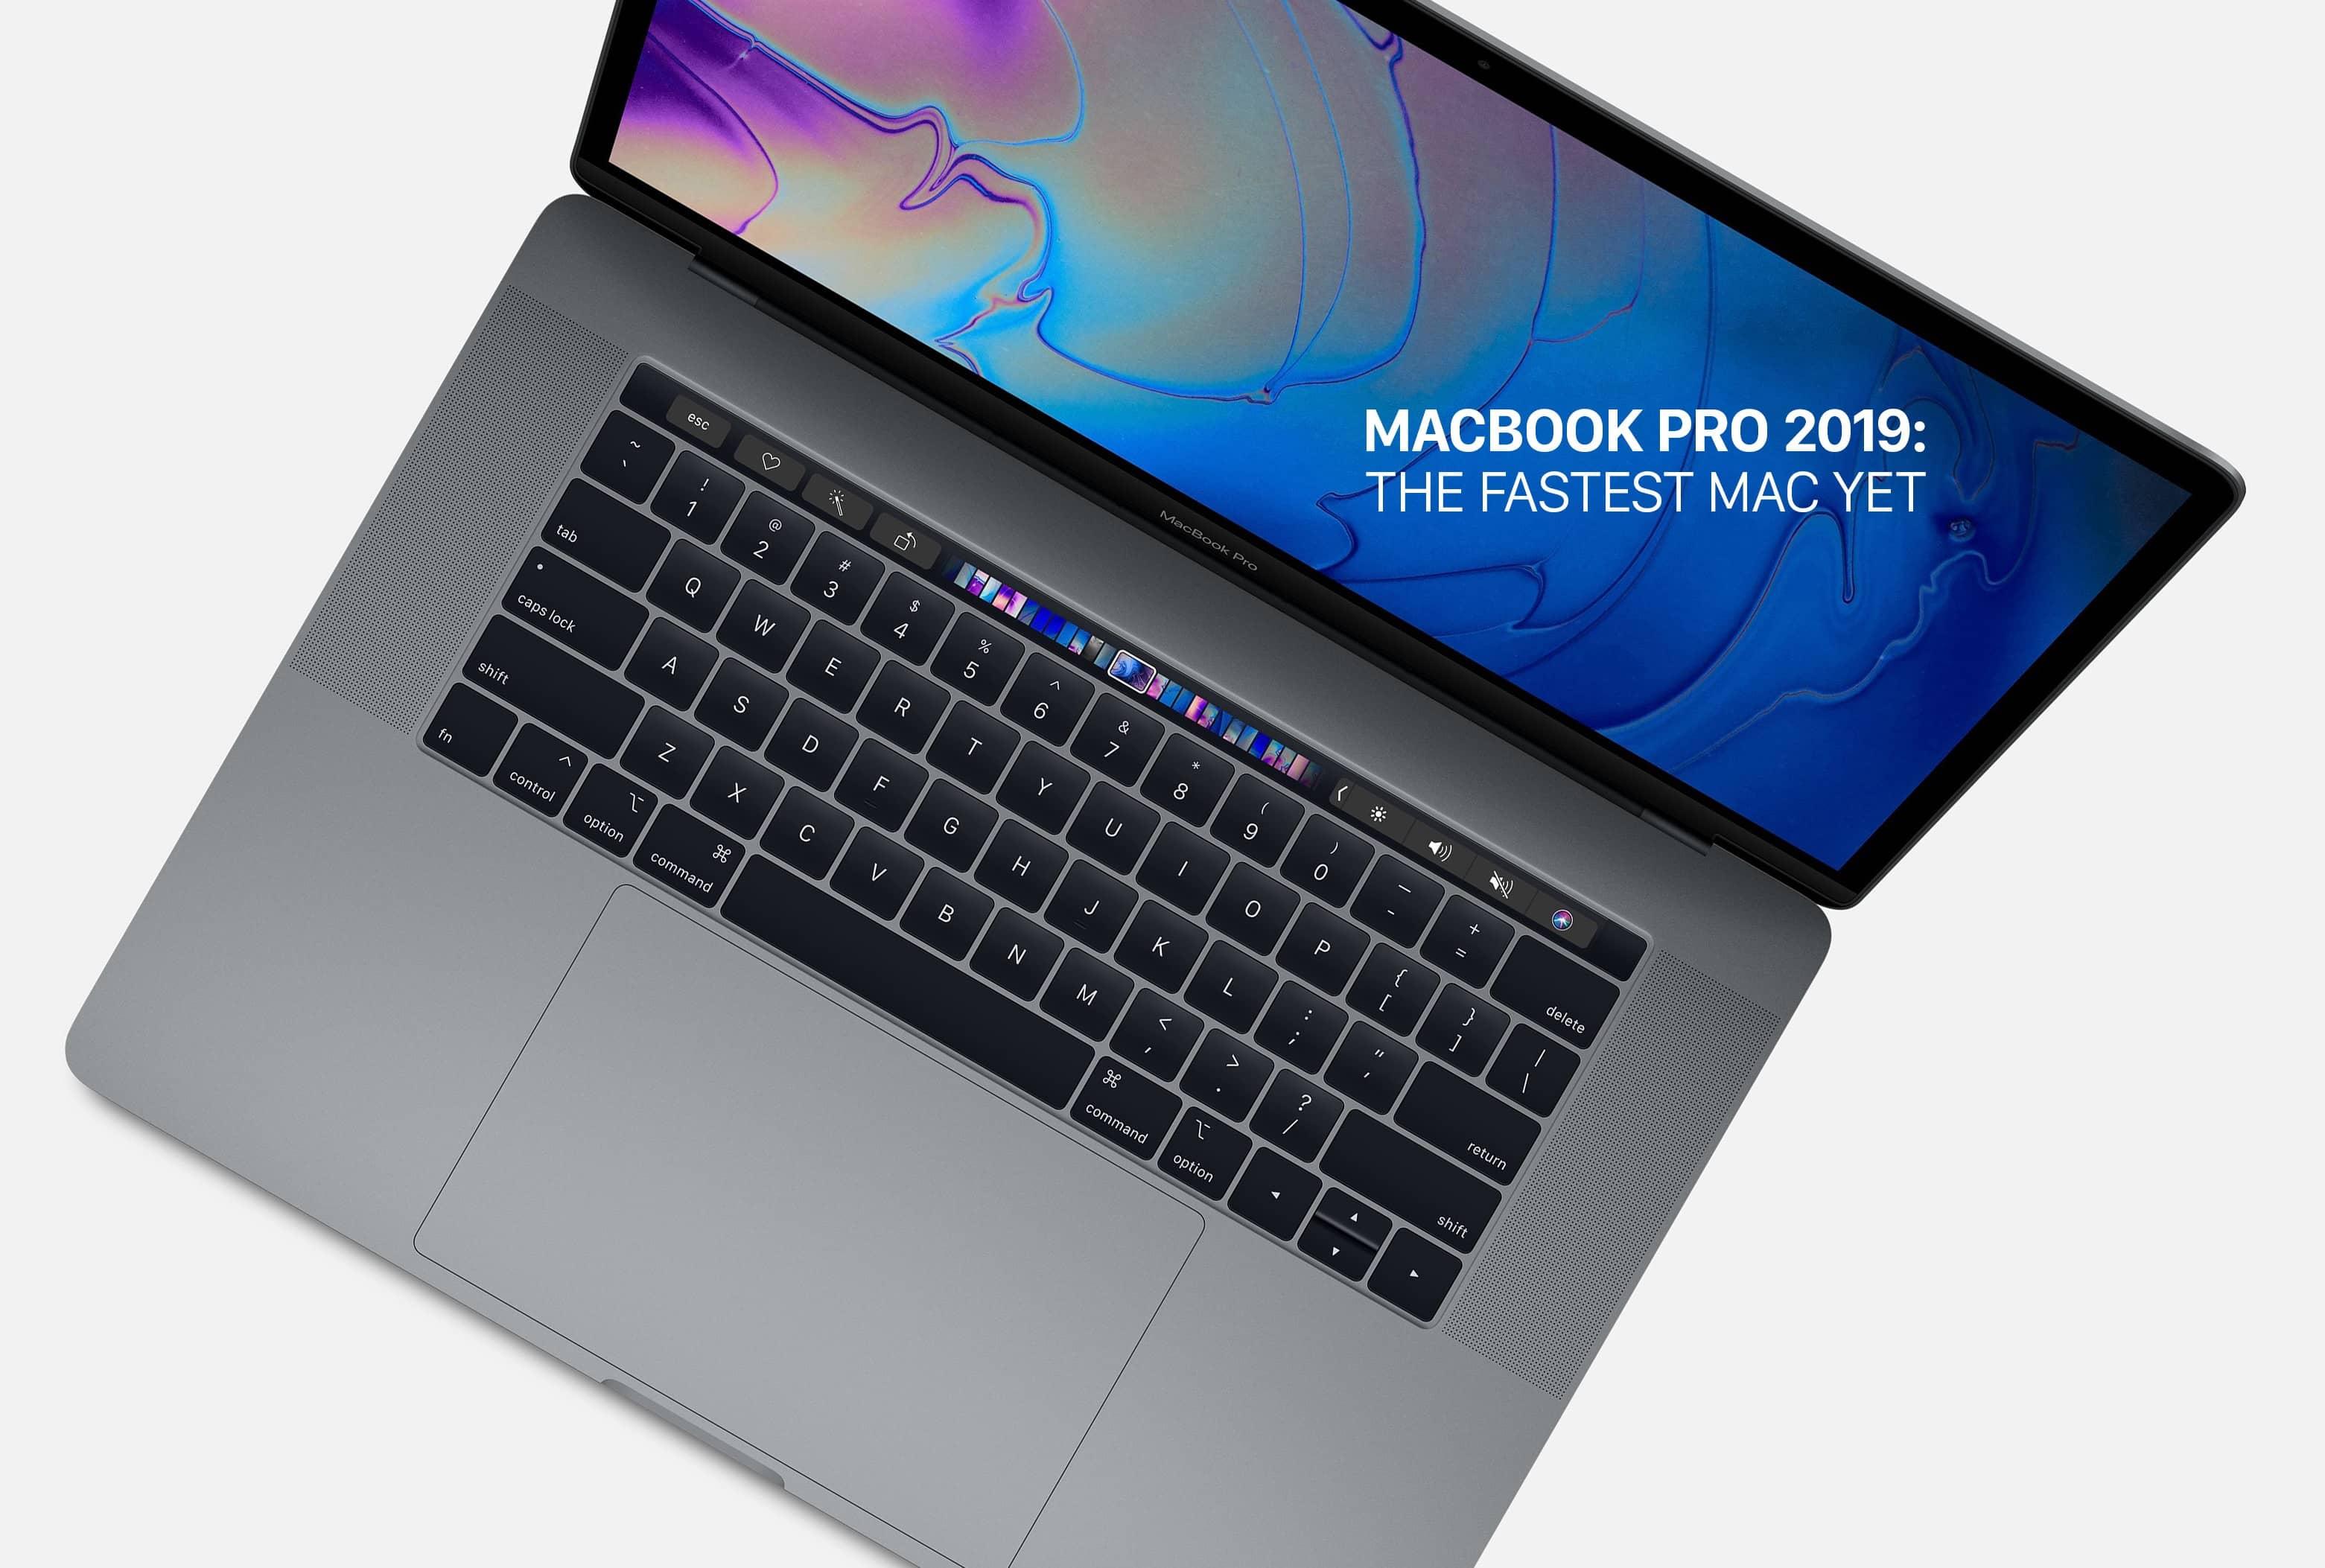 Macbook Pro 2019: The Fastest Mac Yet